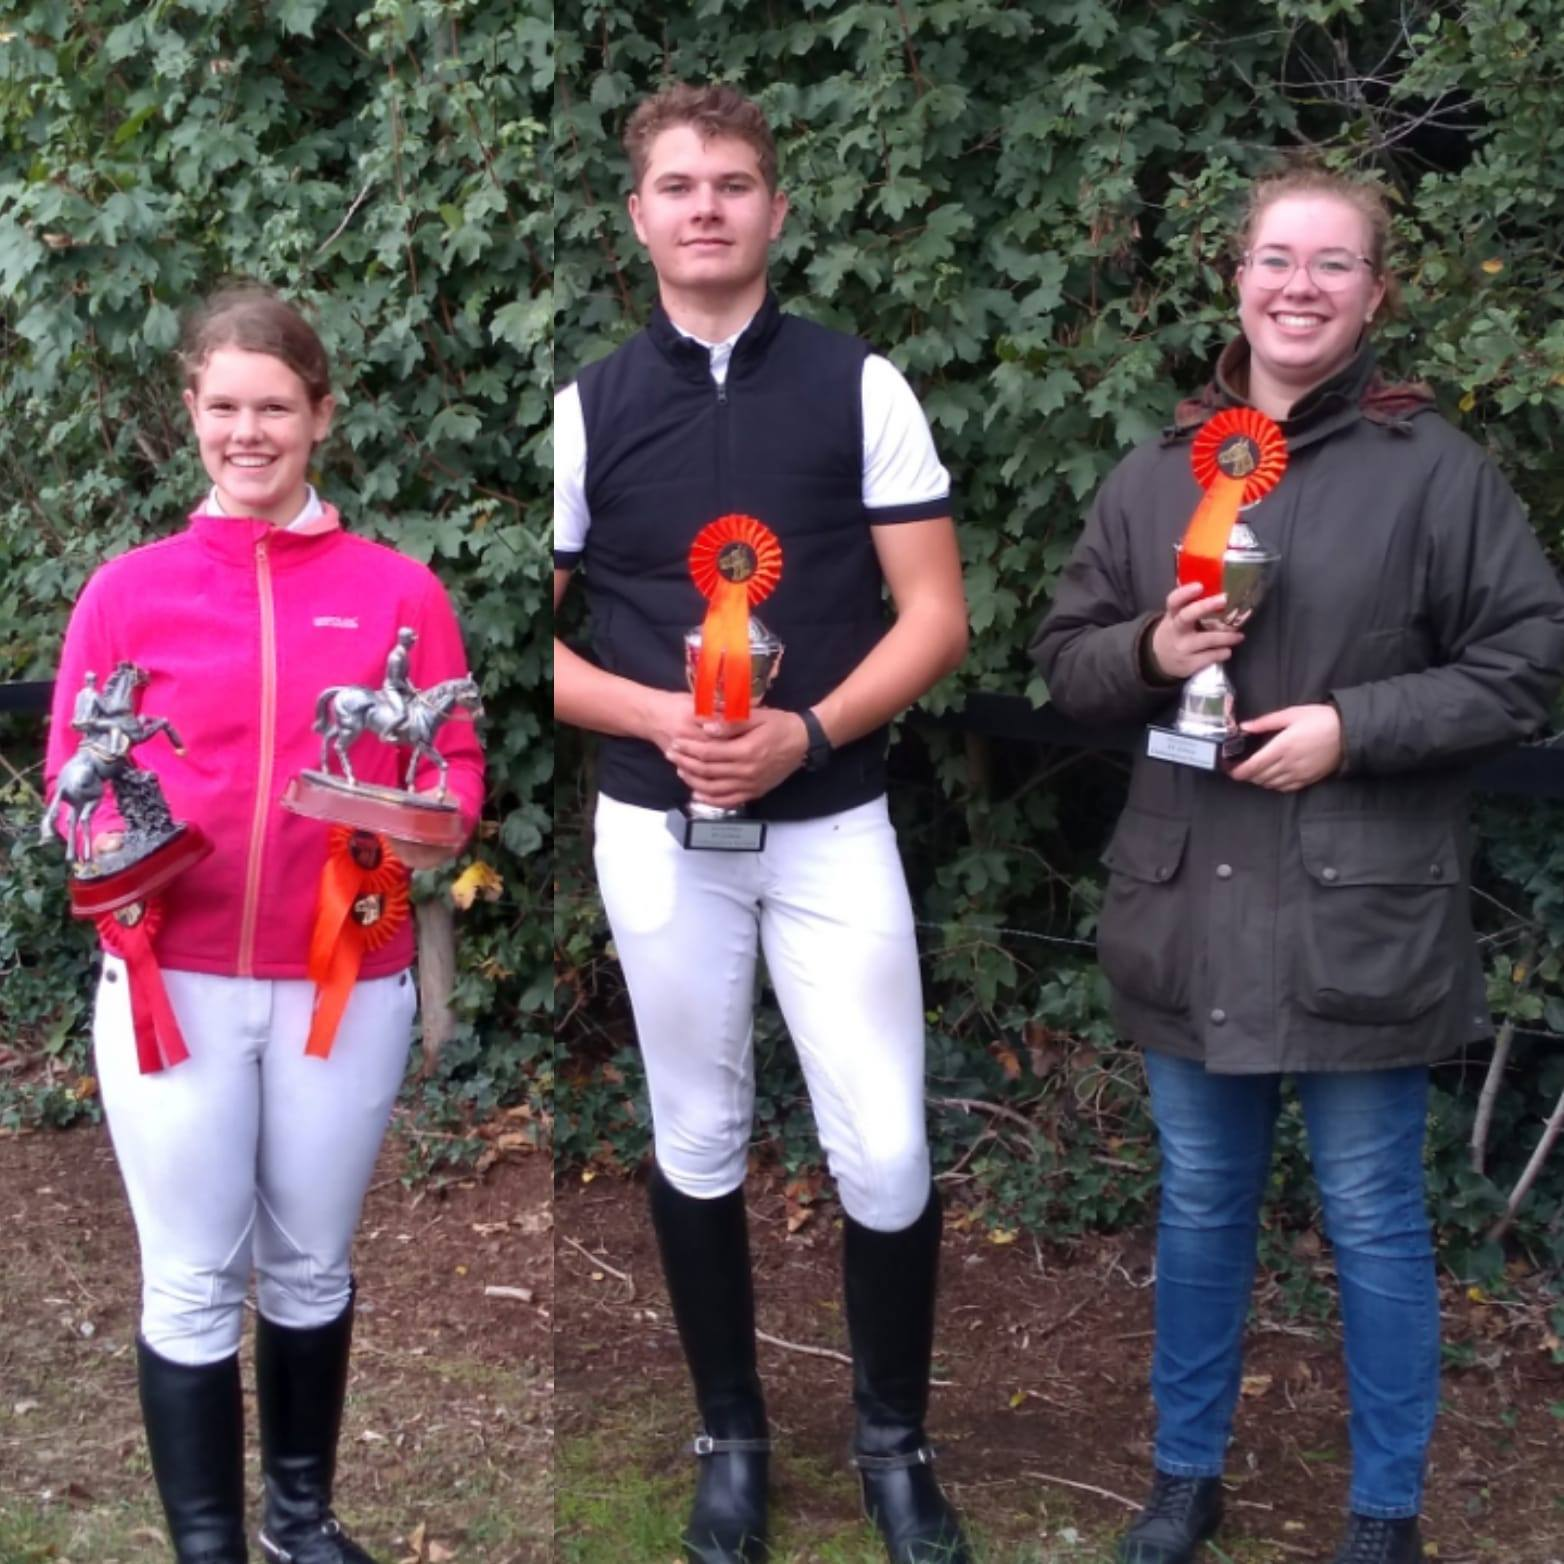 Anne, Jesse en Sanne clubkampioenen van 2020 bij RV en PC Zelhem